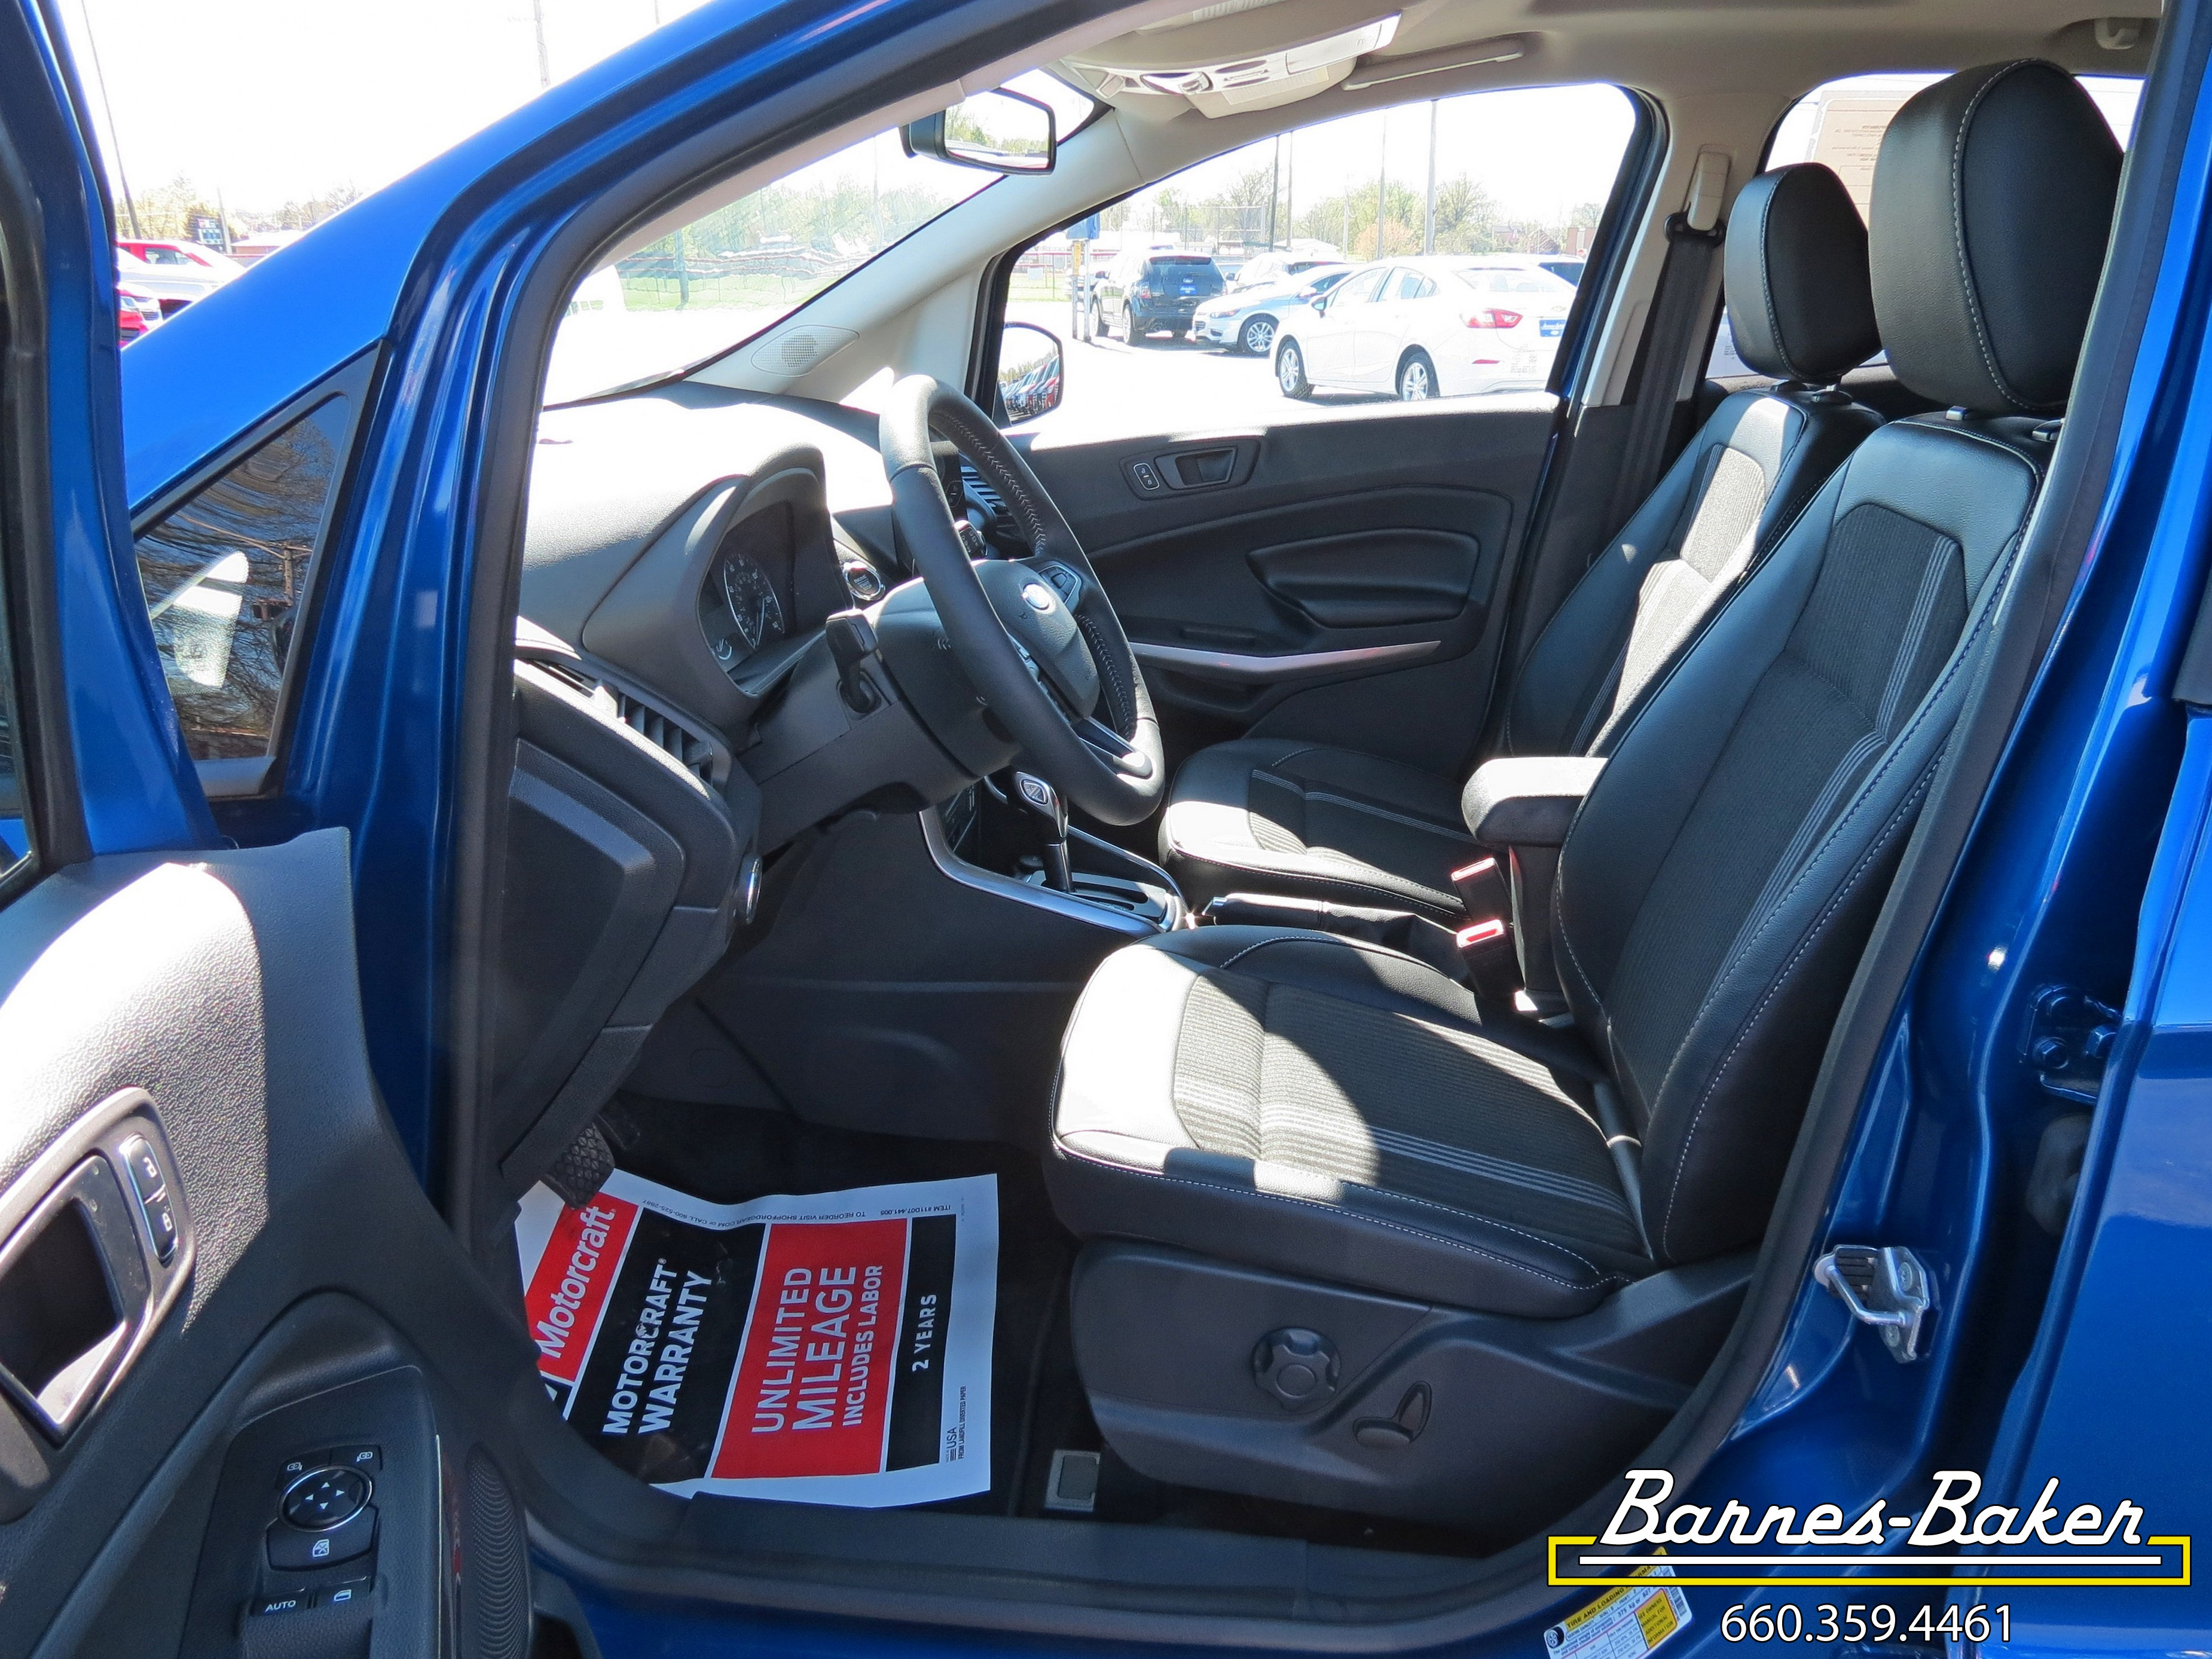 New 2019 Lightning Blue Ford EcoSport For Sale   Trenton, MO